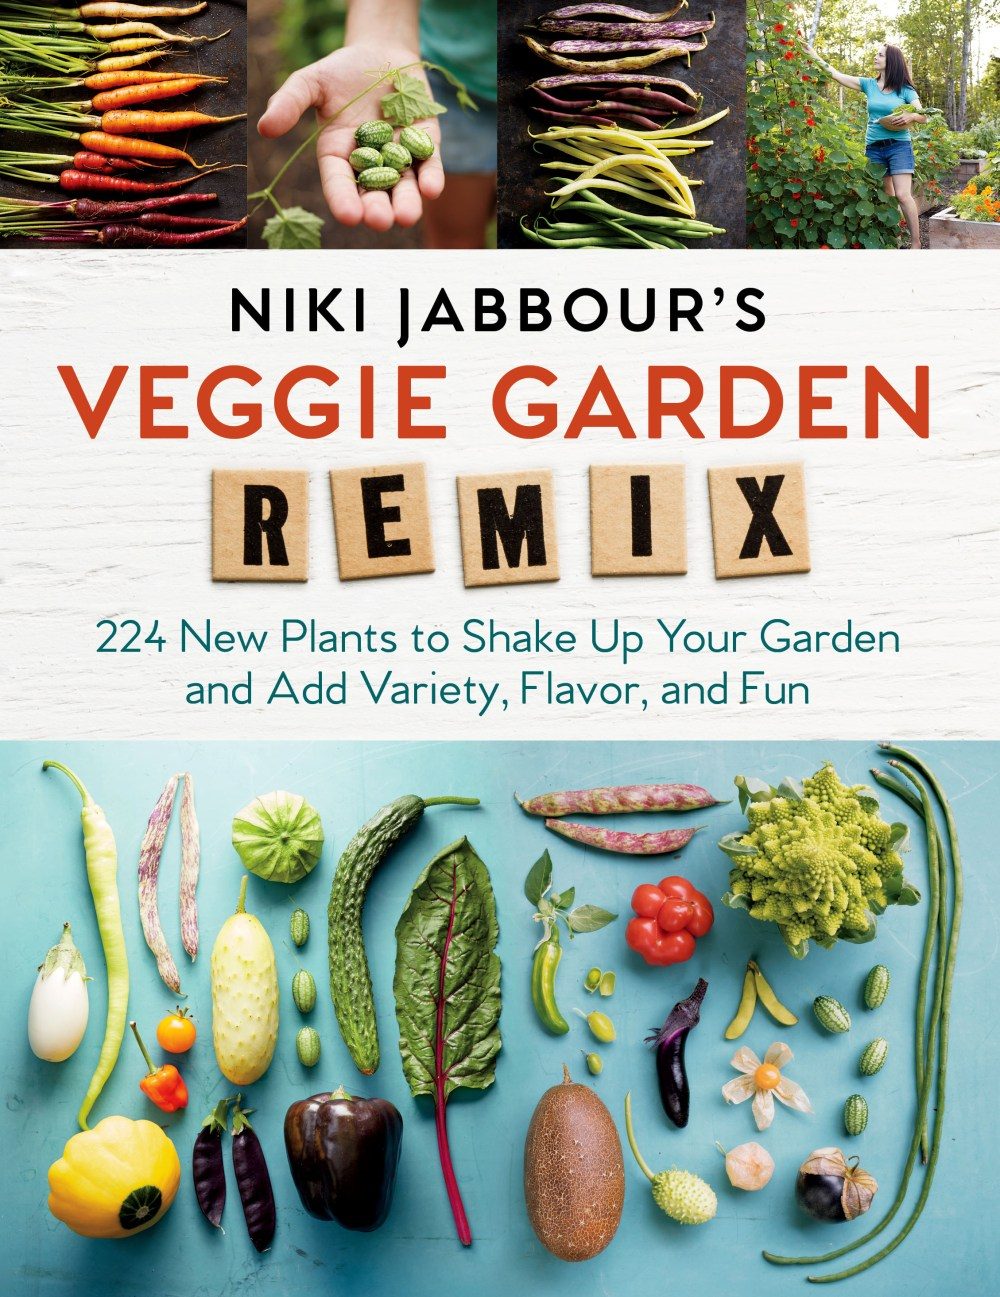 Niki Jabbour's Veggie Garden Remix.